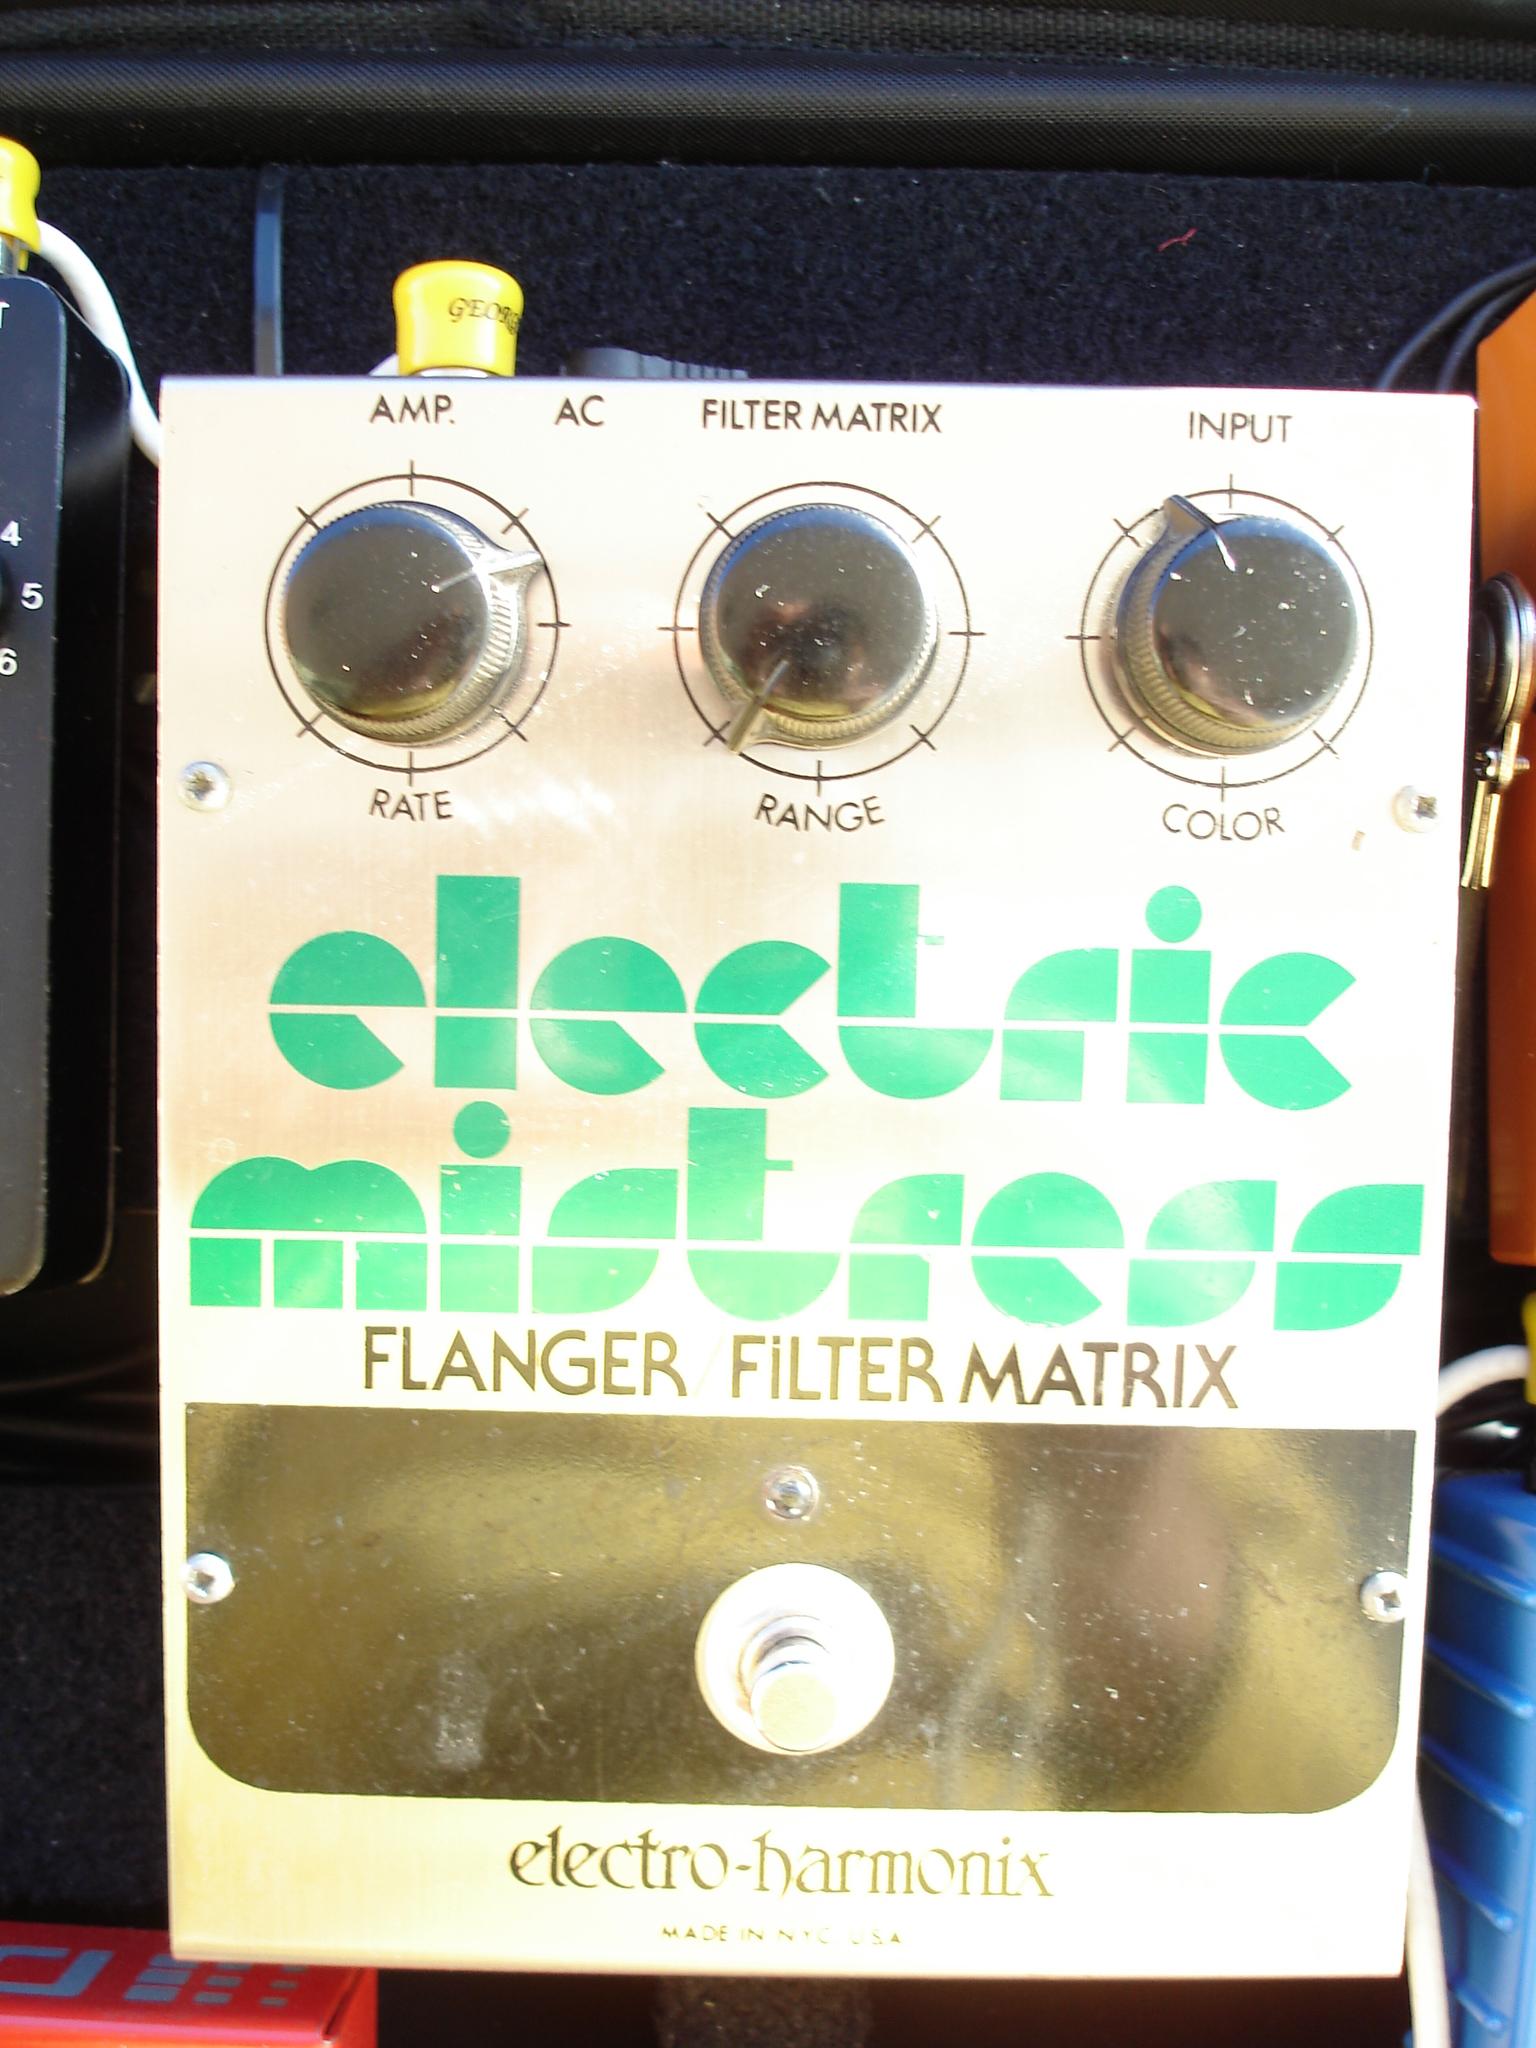 Electro Harmonix Electric Misress